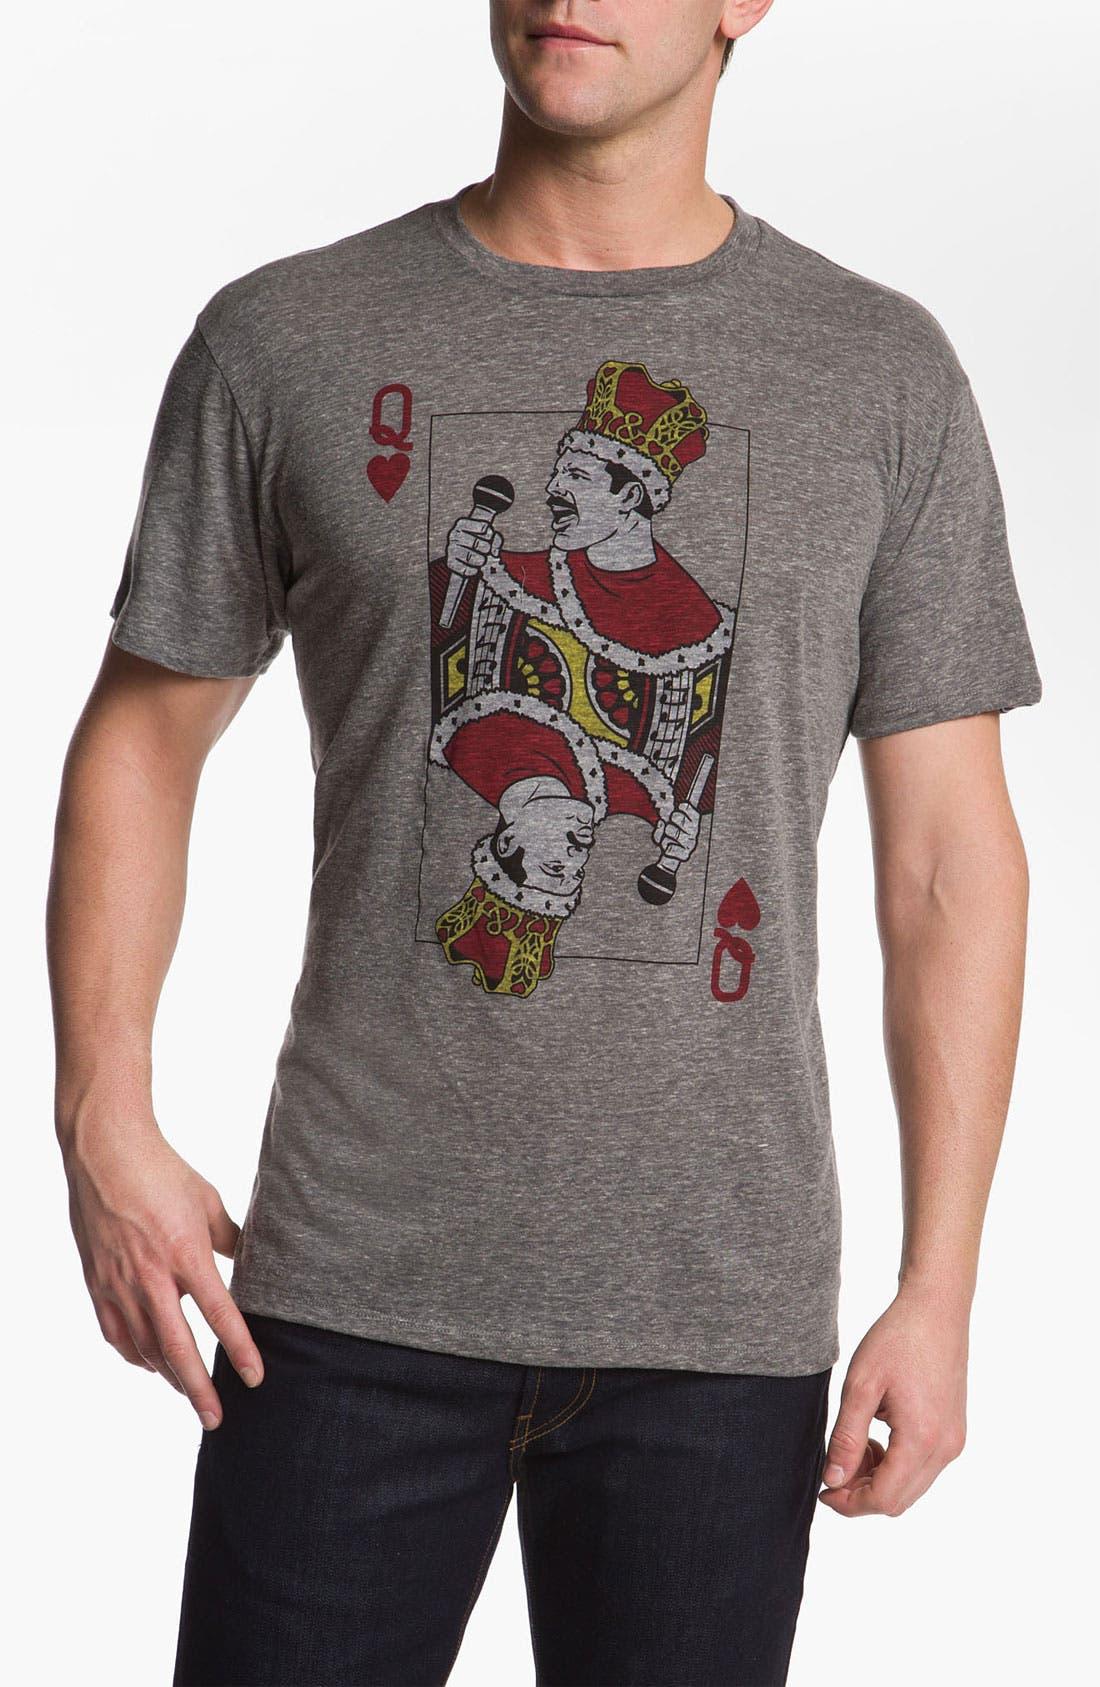 Main Image - Headline Shirts 'Queen' Graphic T-Shirt